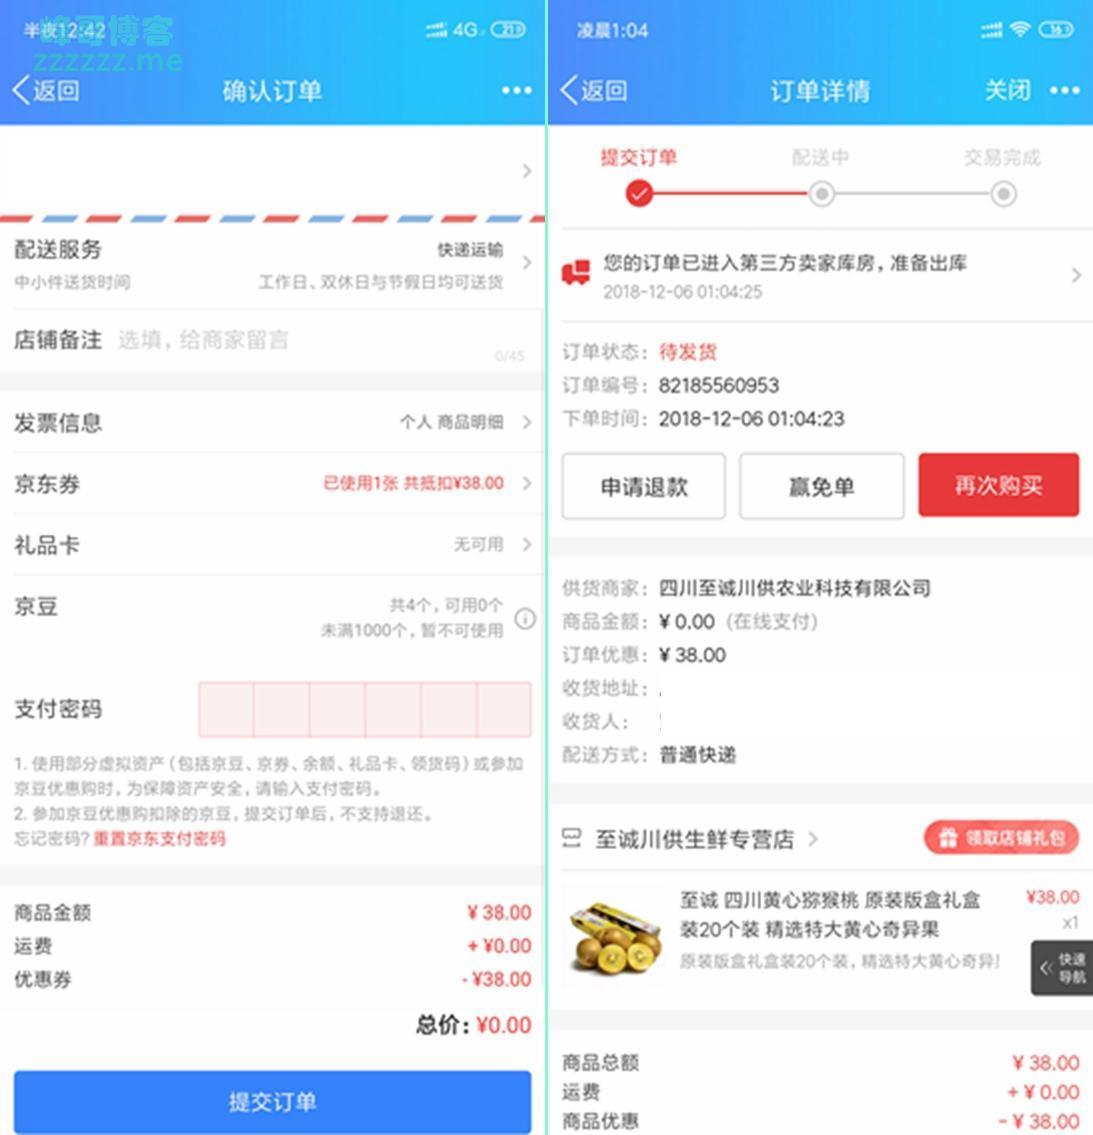 QQ京东活动 3元买20个奇异果或5斤不知火丑橘